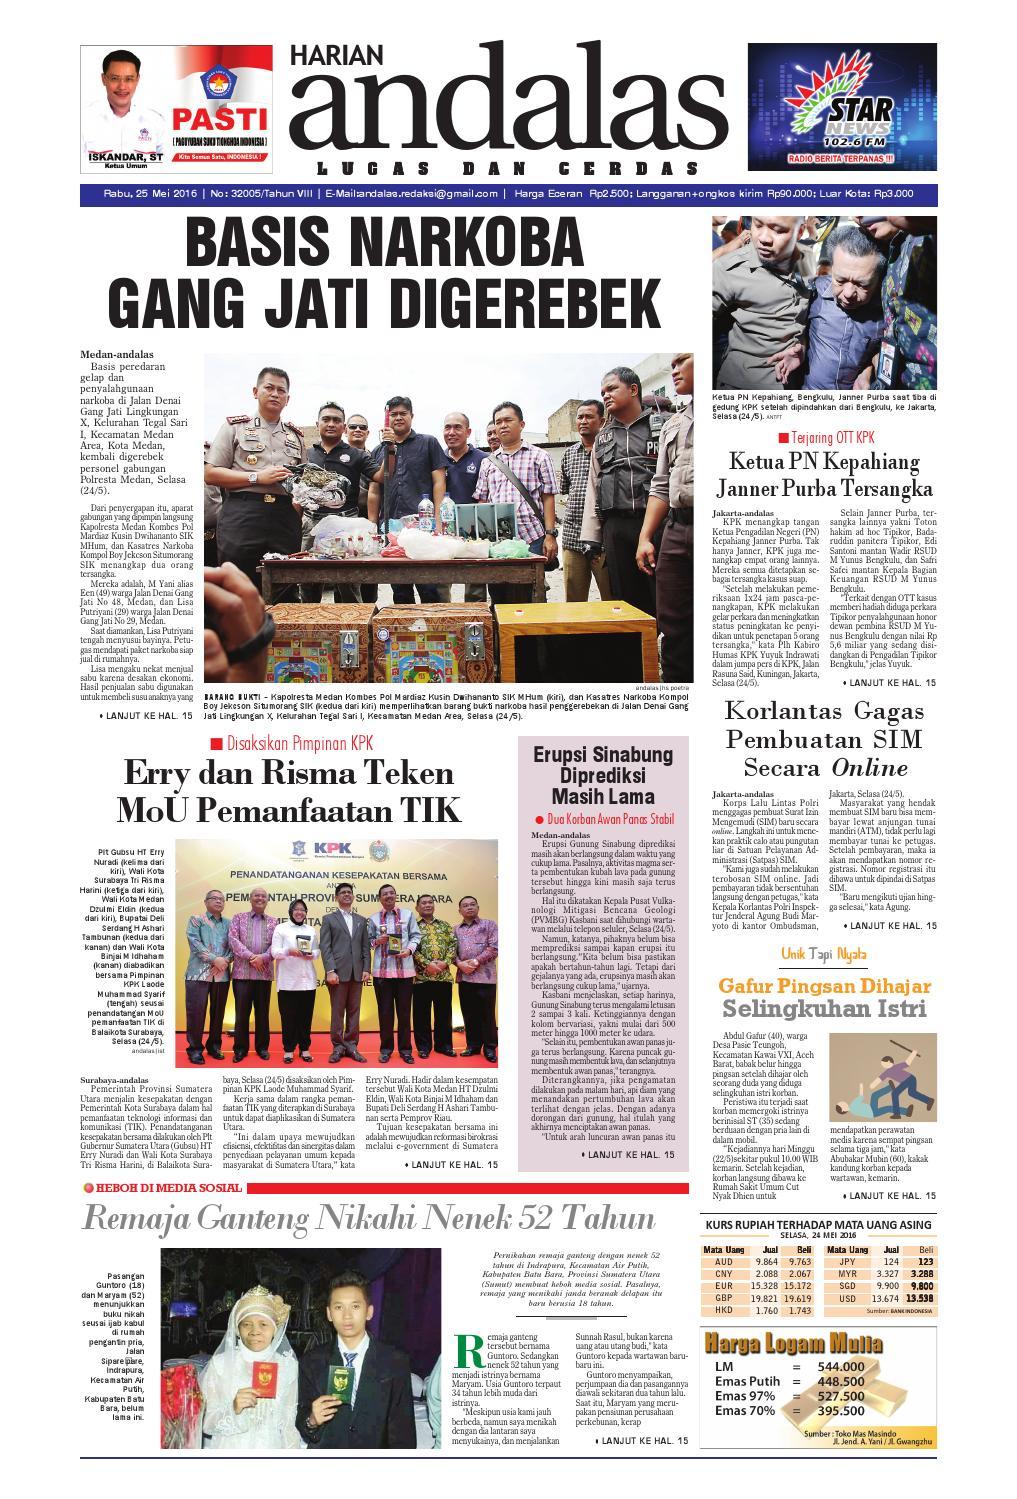 Epaper andalas edisi rabu 25 mei 2016 by media andalas - issuu e67c50b6df